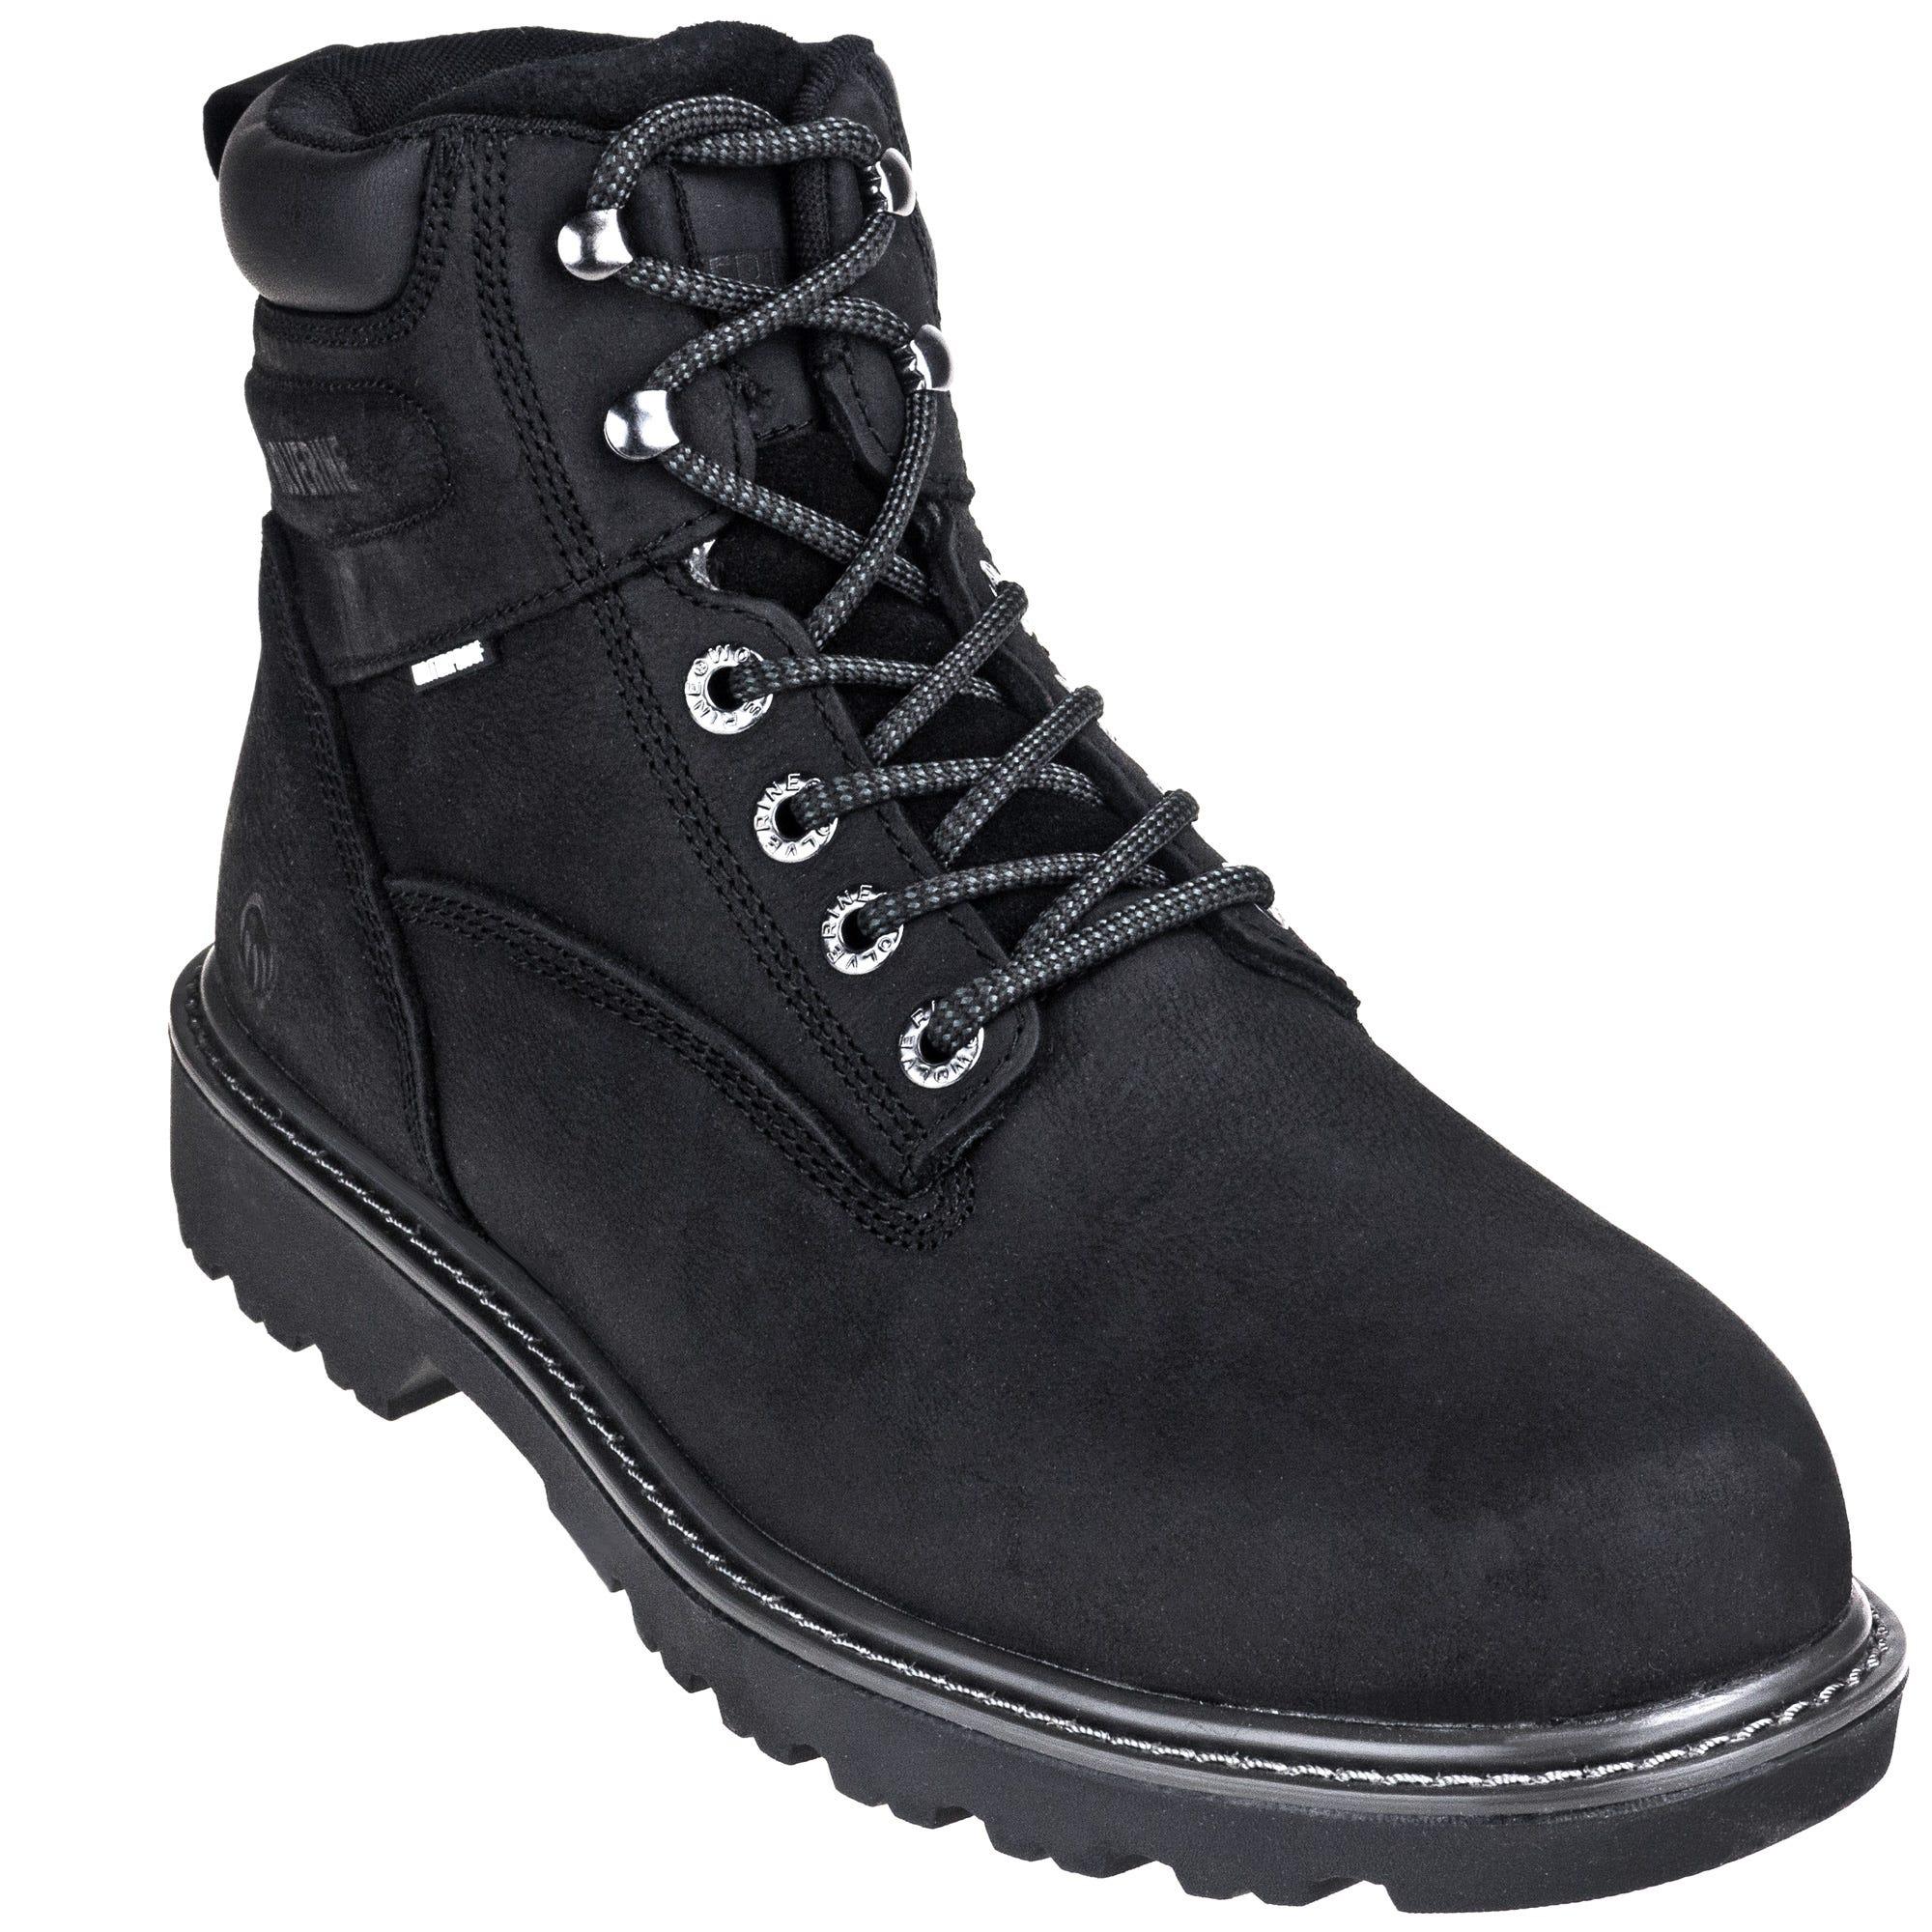 ad811d0e7c4 Wolverine Men's Boots   MenStyle USA